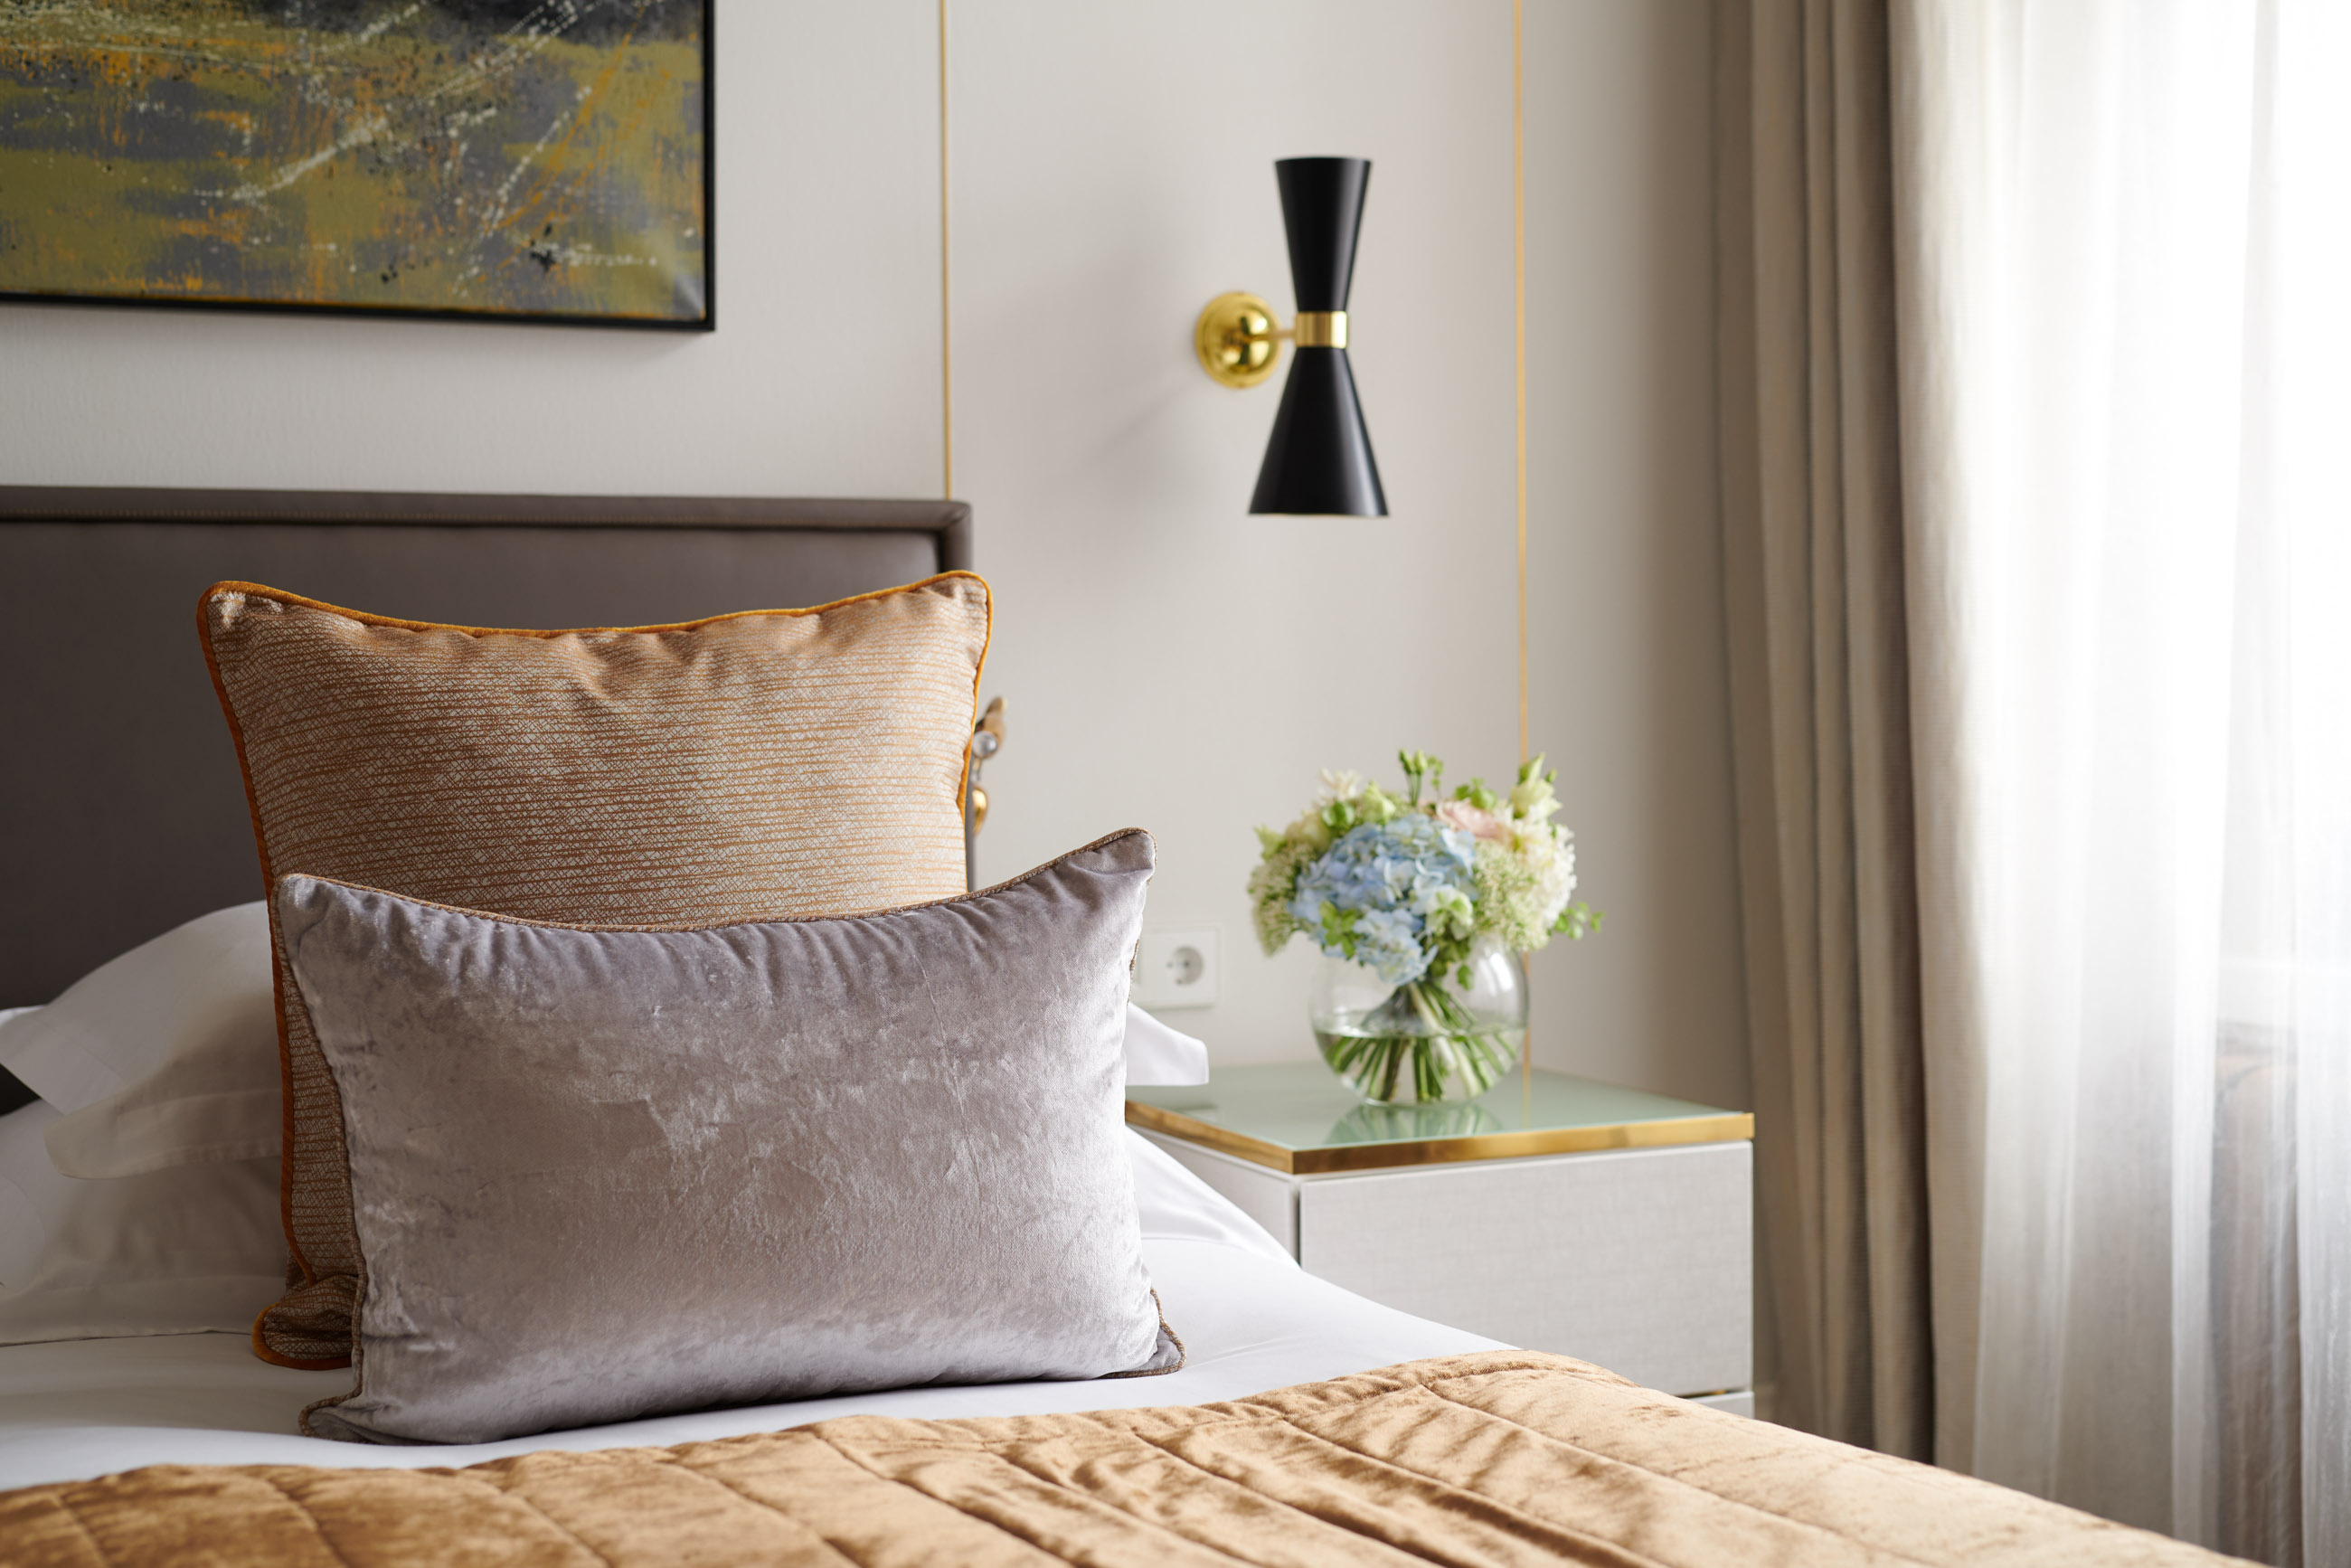 https://bubo.sk/uploads/galleries/5055/corinthia_st_petersburg_signaturesuite_bedroom_detail.jpg